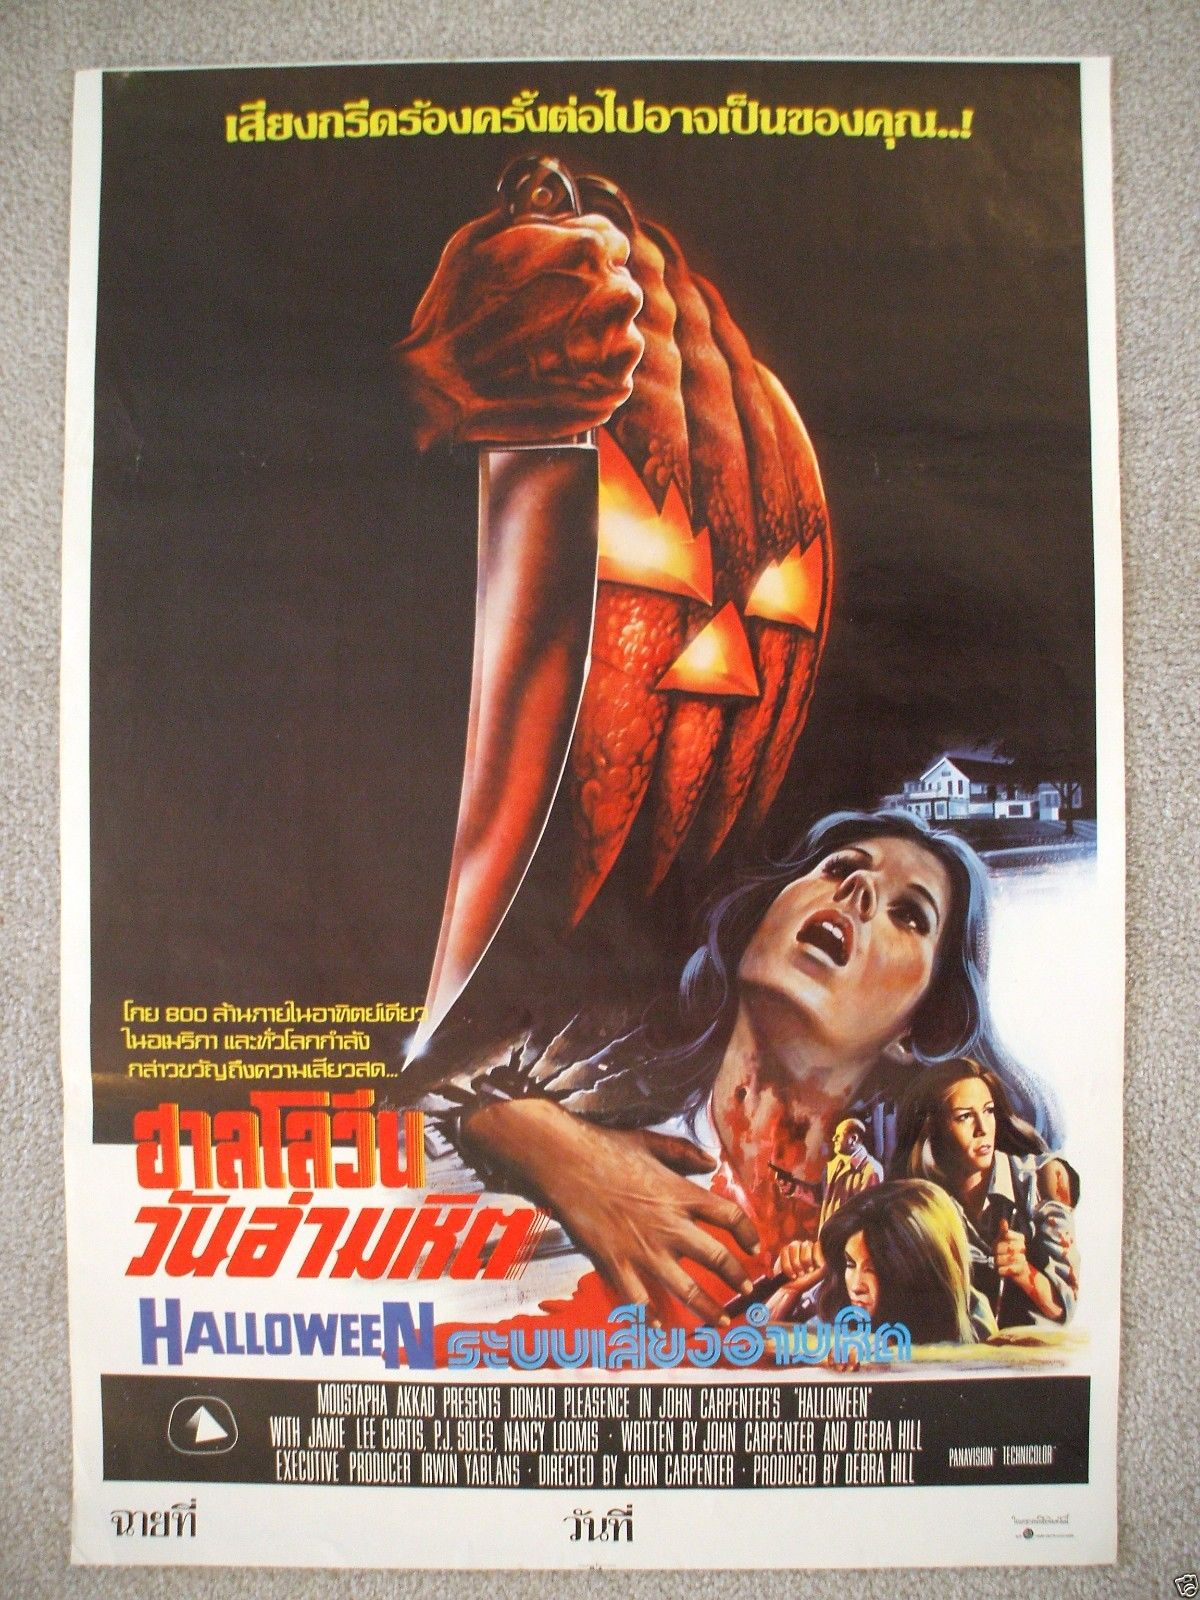 Original halloween 2007 movie poster